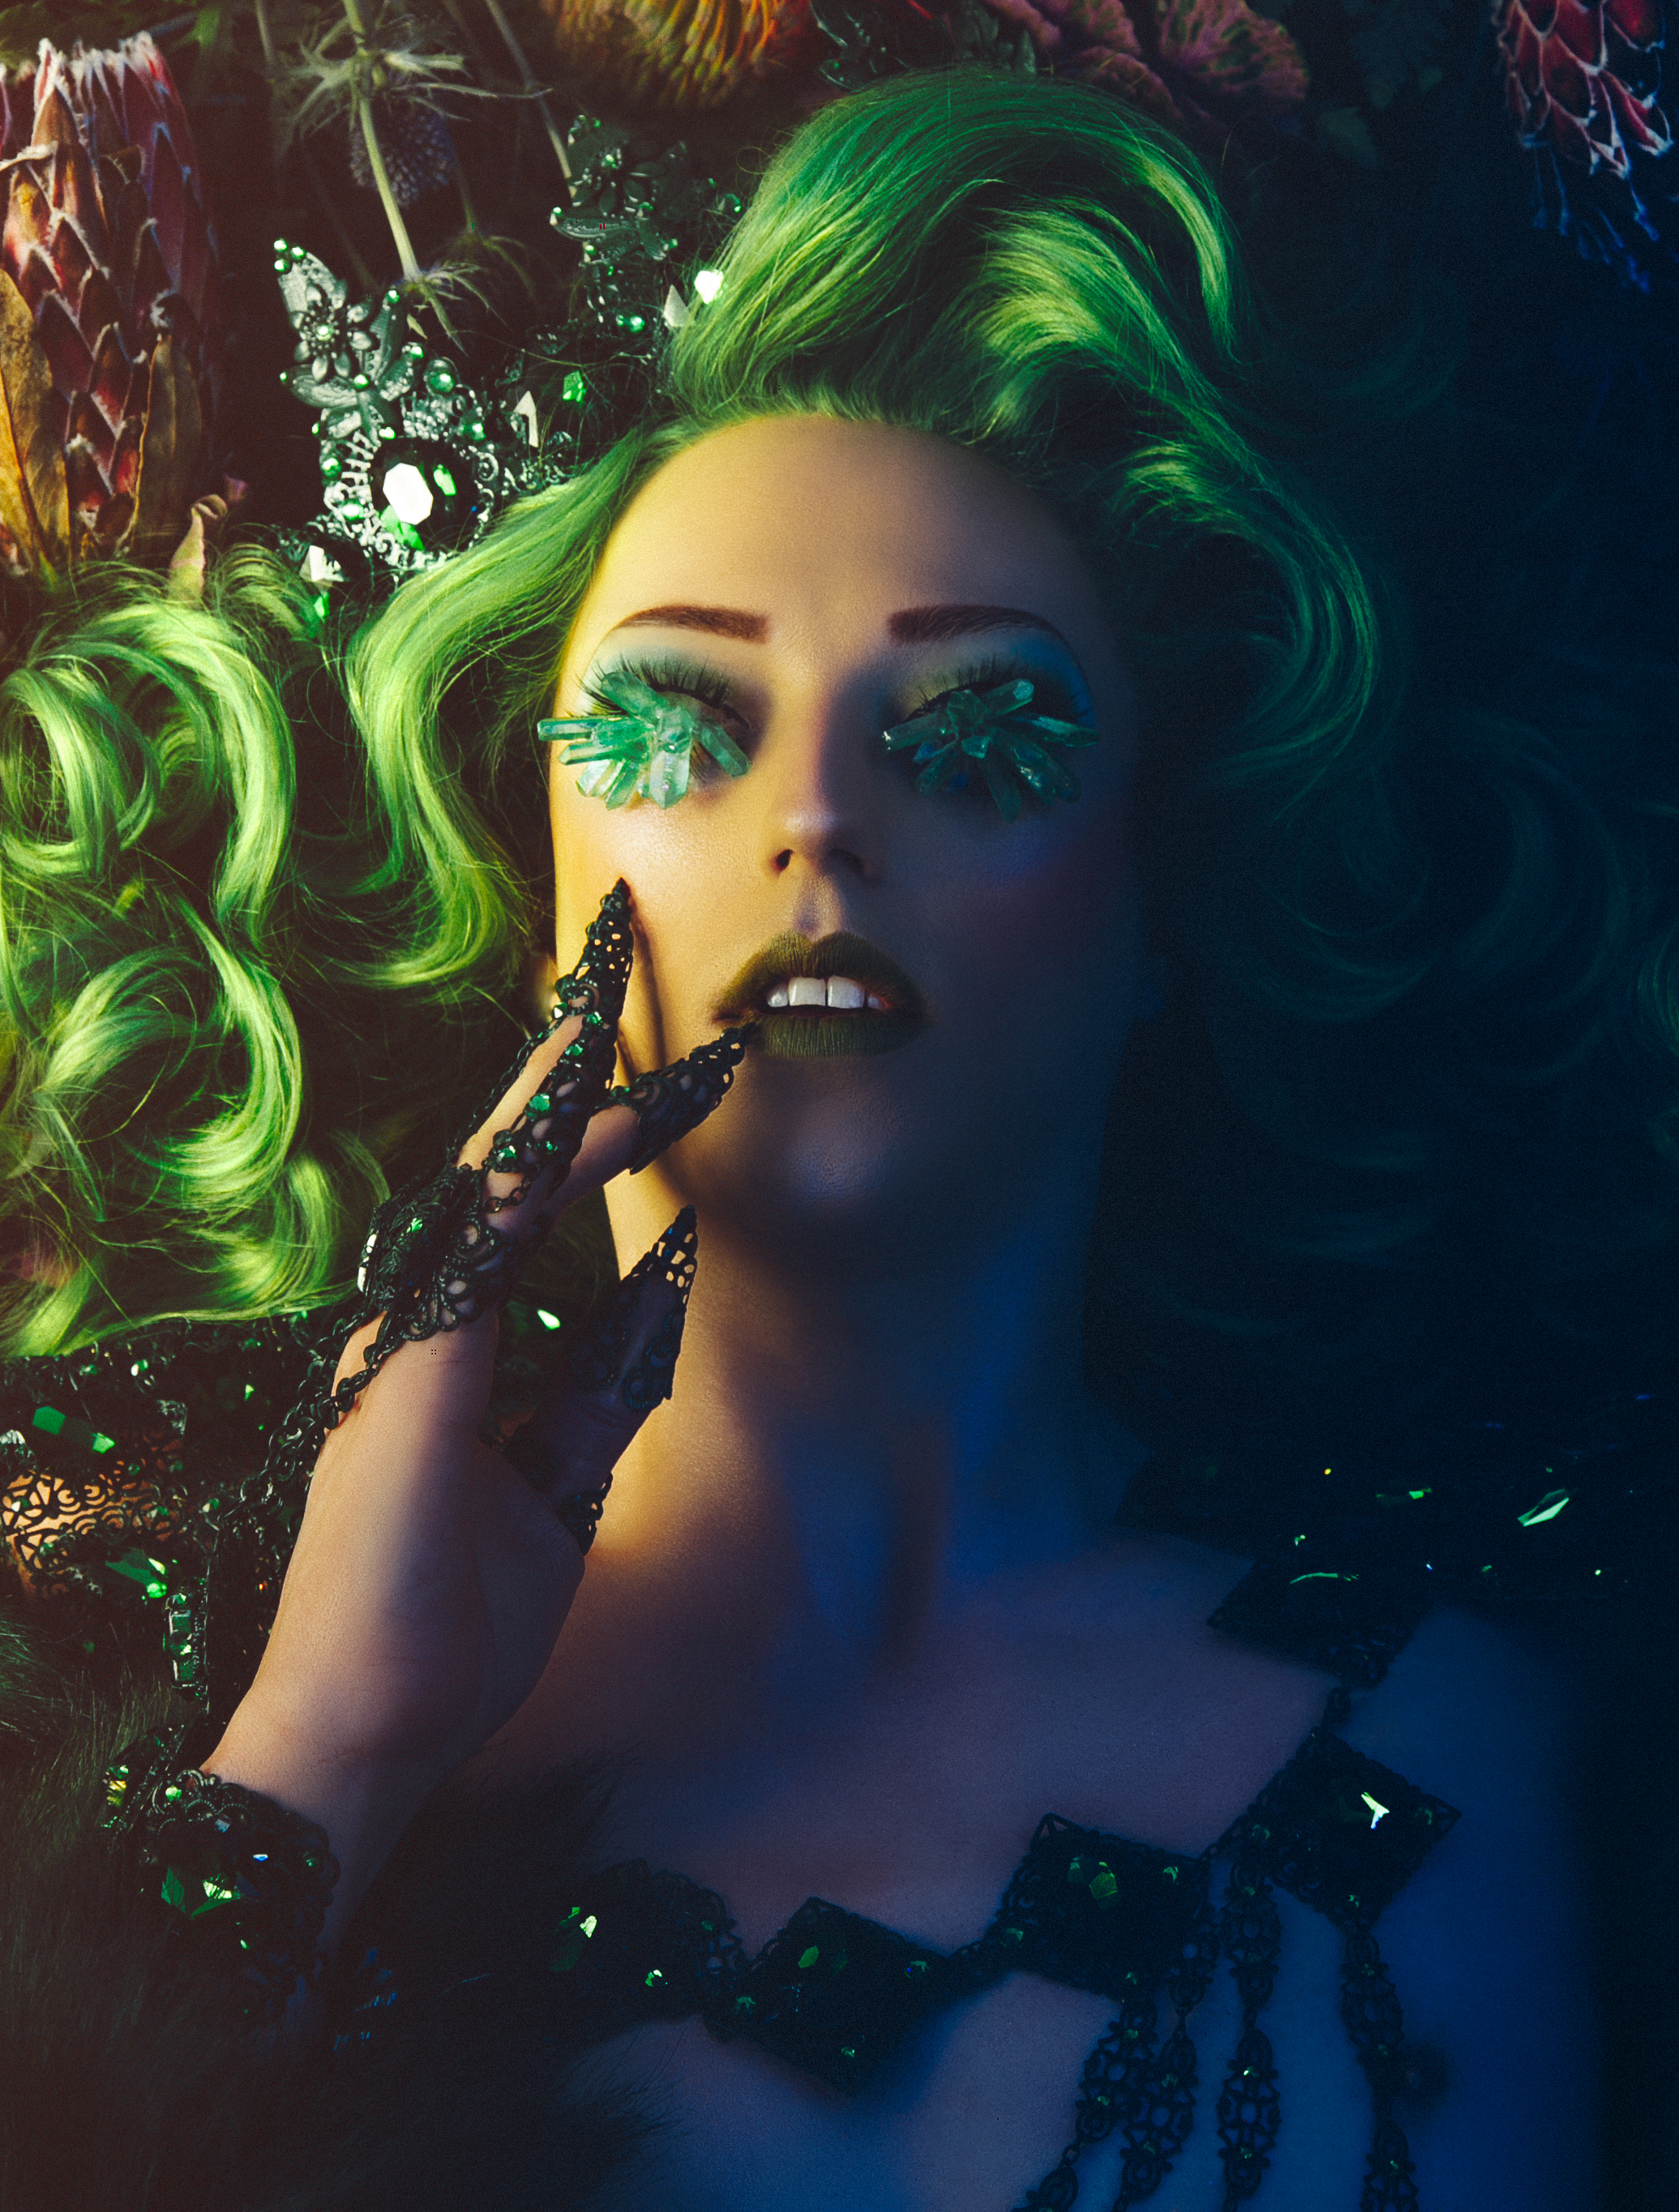 Model: Laganja Estranja  Makeup: Sasha Glasser  Photographer: Alena Mealy  Art Director: Danica Kennedy  Accessories: Marianna Harutunian  Wig: Jason Adcock⠀  Fur: Matt Sarafa